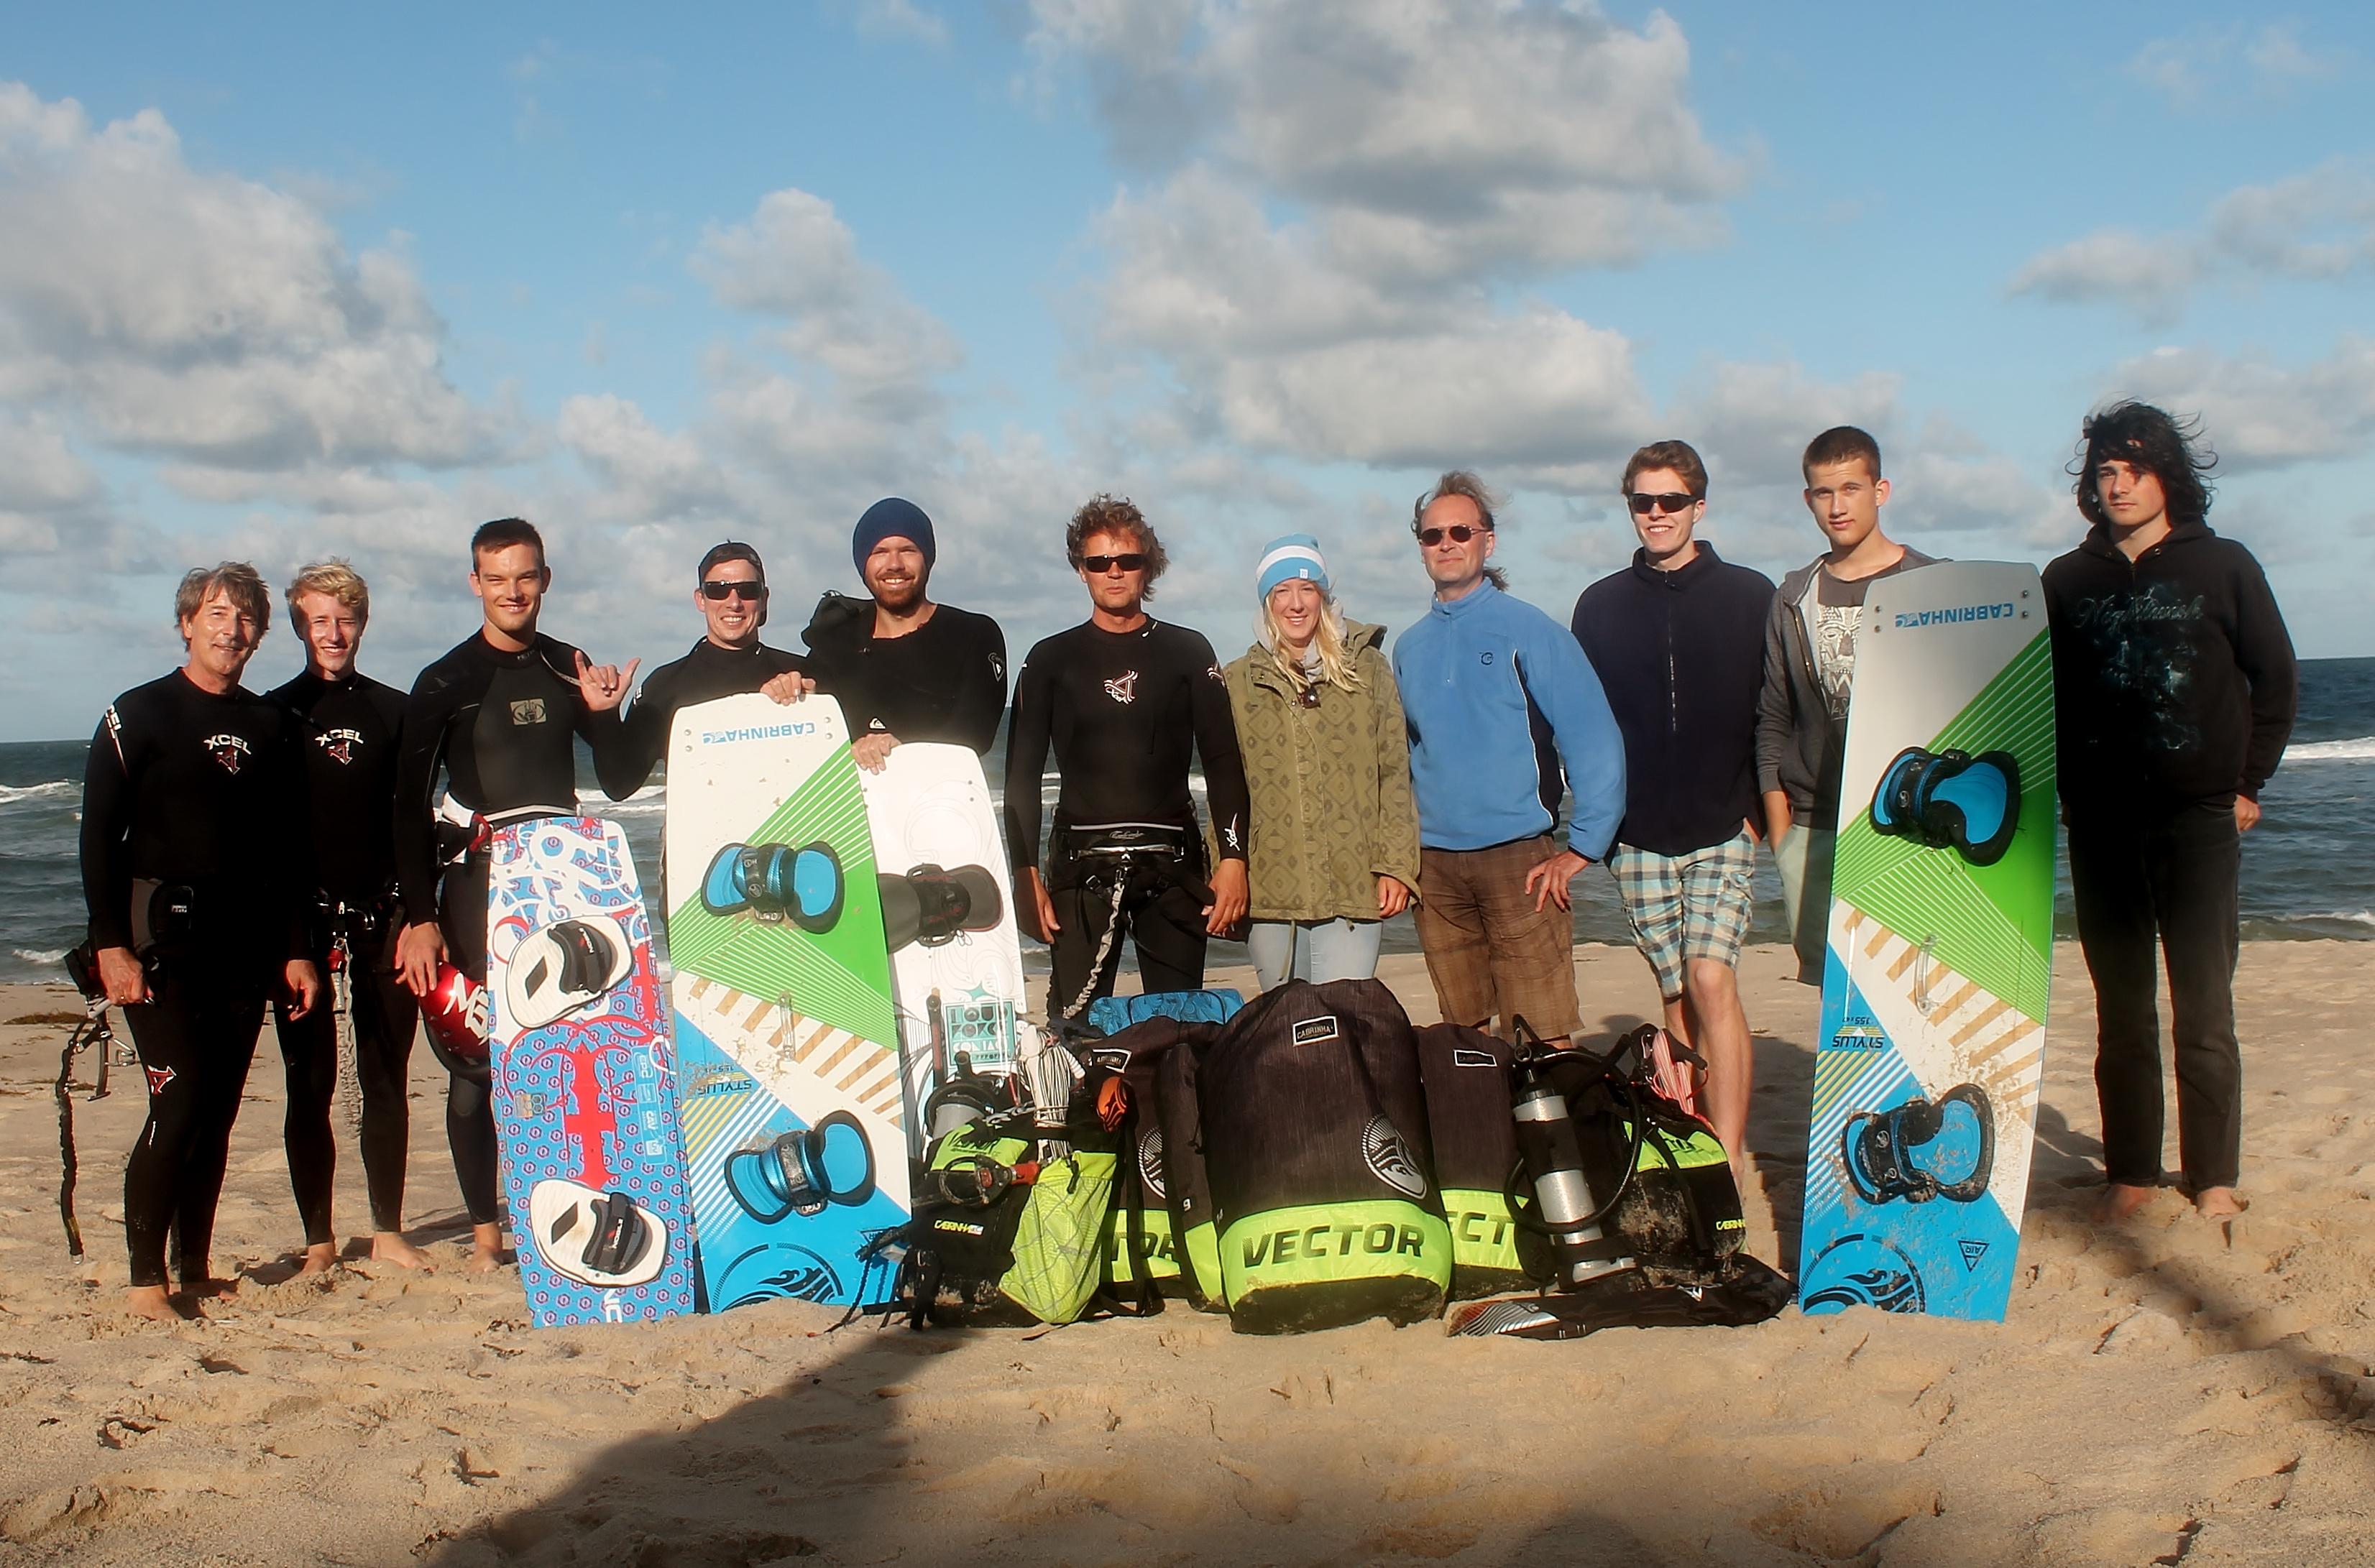 Kiteschule Sylt | Kitesurfen lernen Surfschule Suedkap